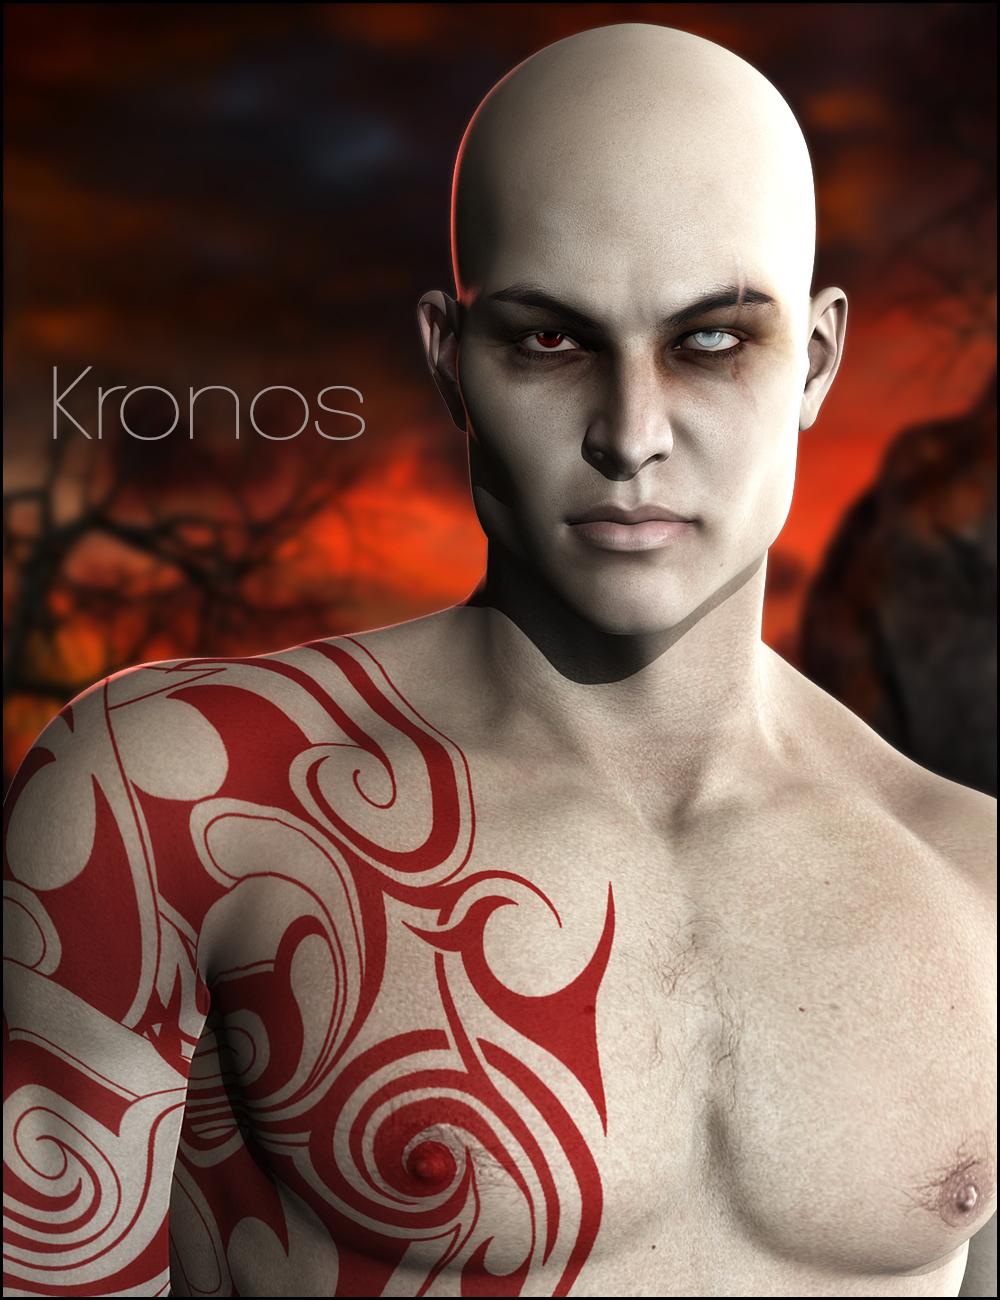 Kronos by: JessaiiCountess, 3D Models by Daz 3D